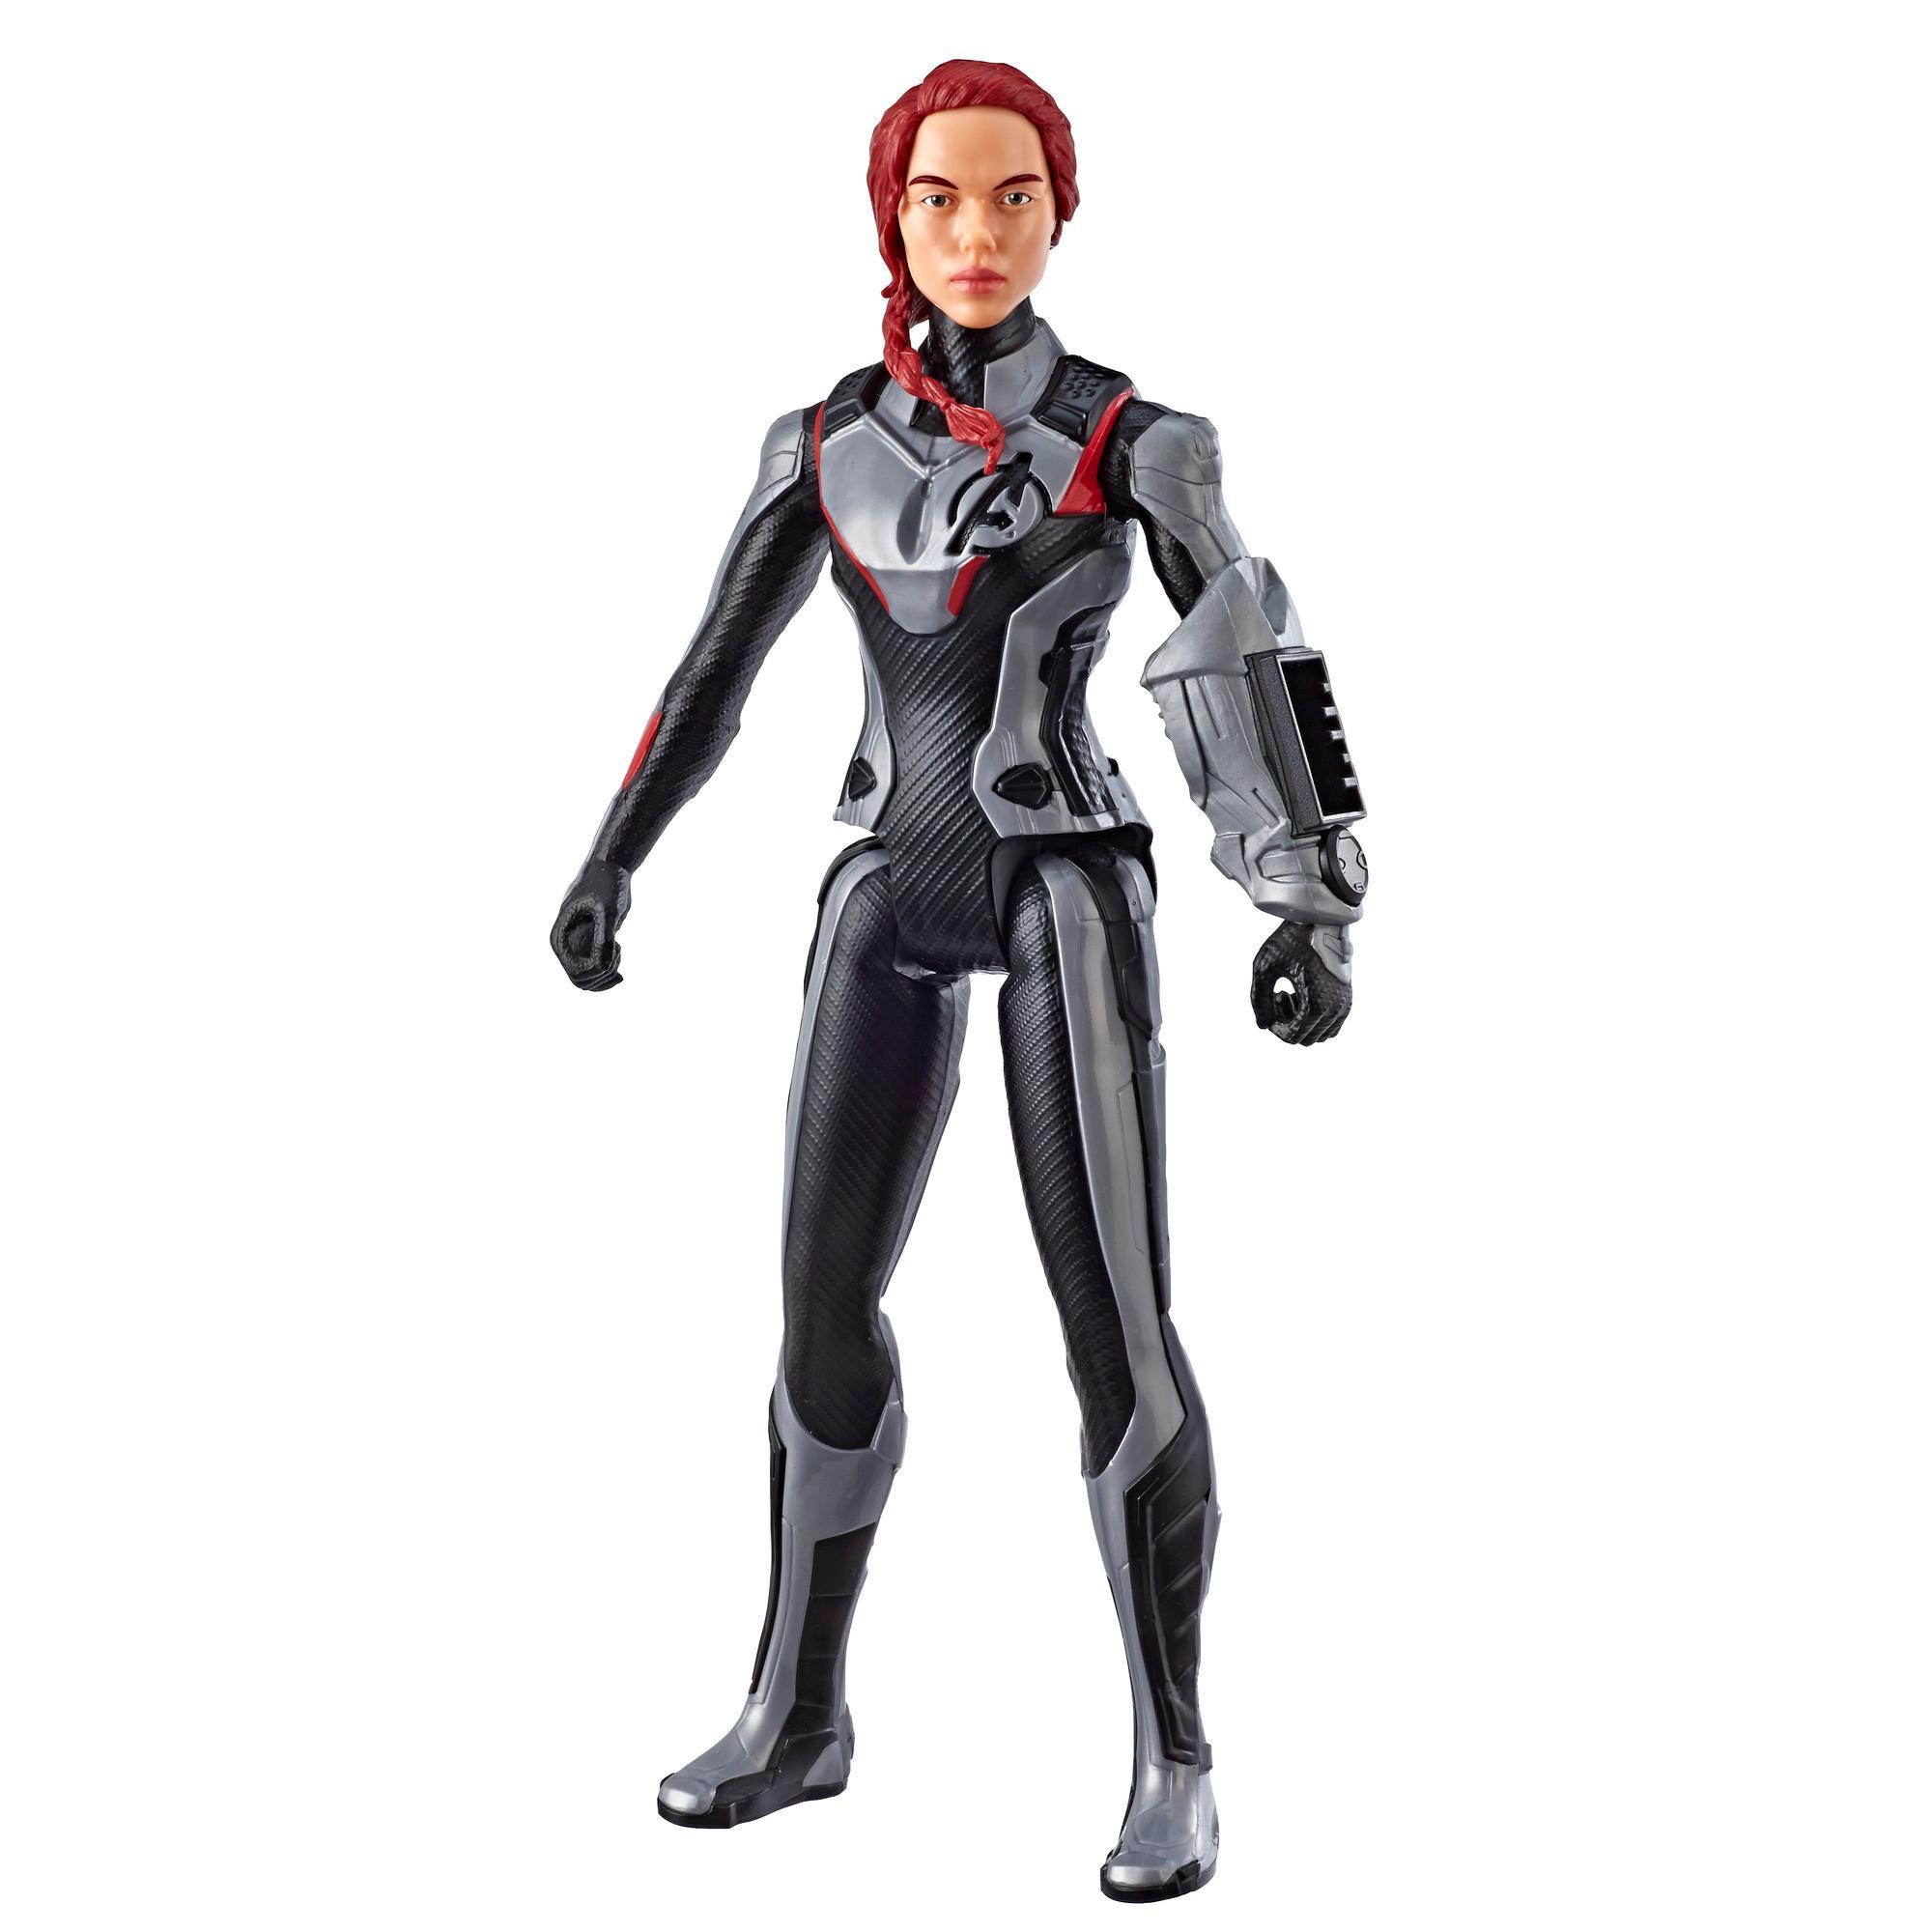 Avengers Endgame Titan Hero Black Widow